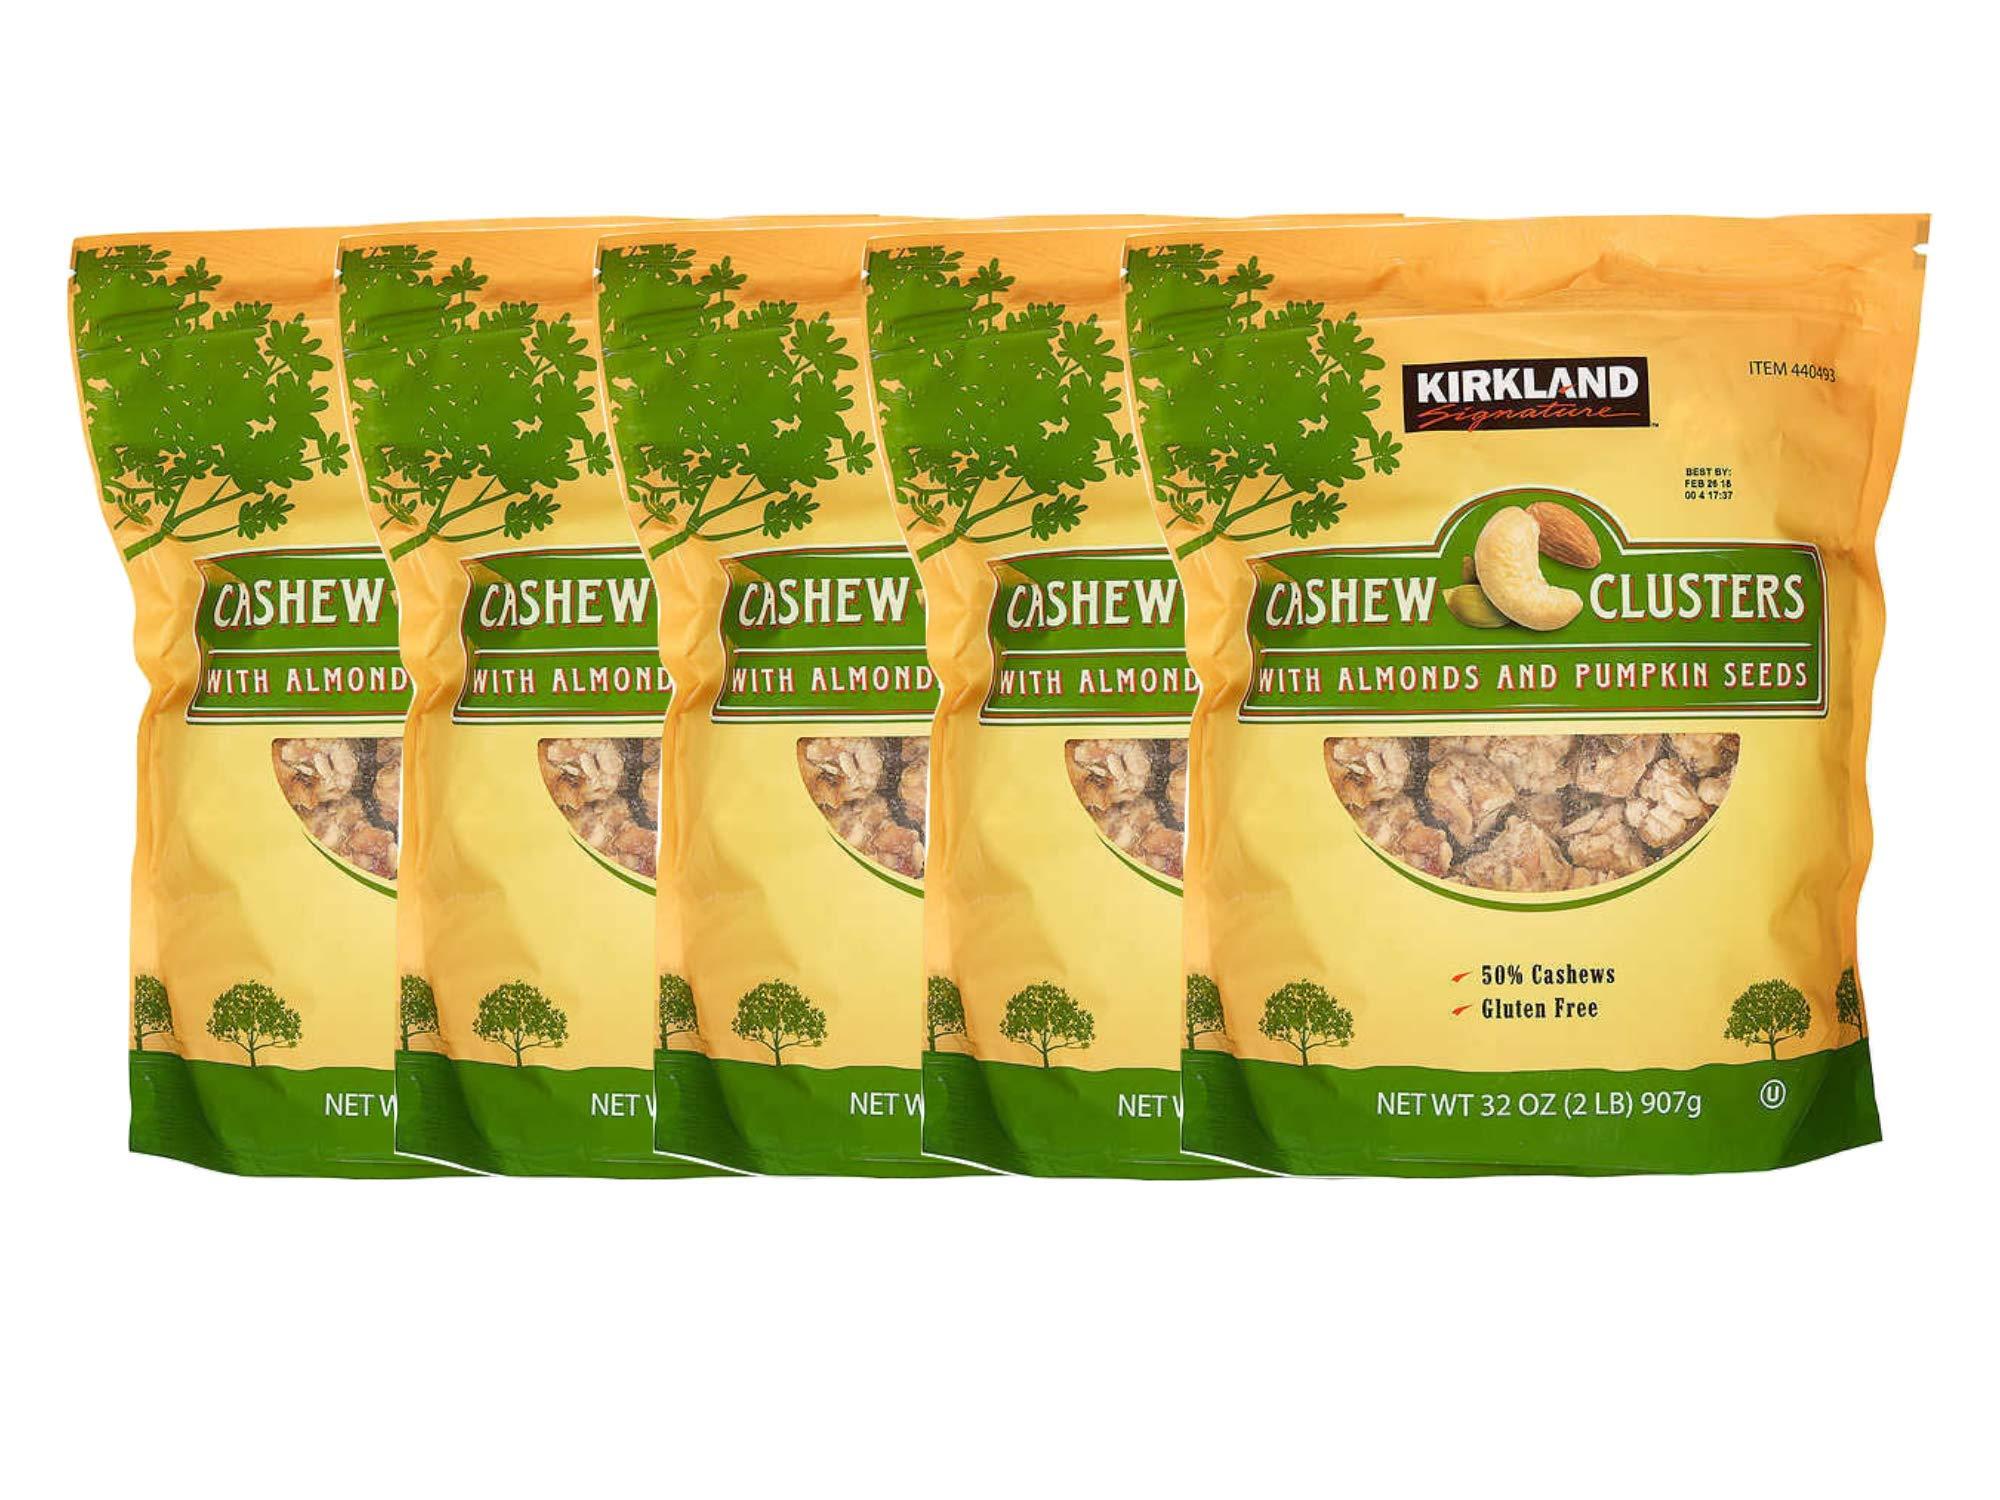 Kirkland Signature Cashew Clusters 32 oz per each (Pack of 5)